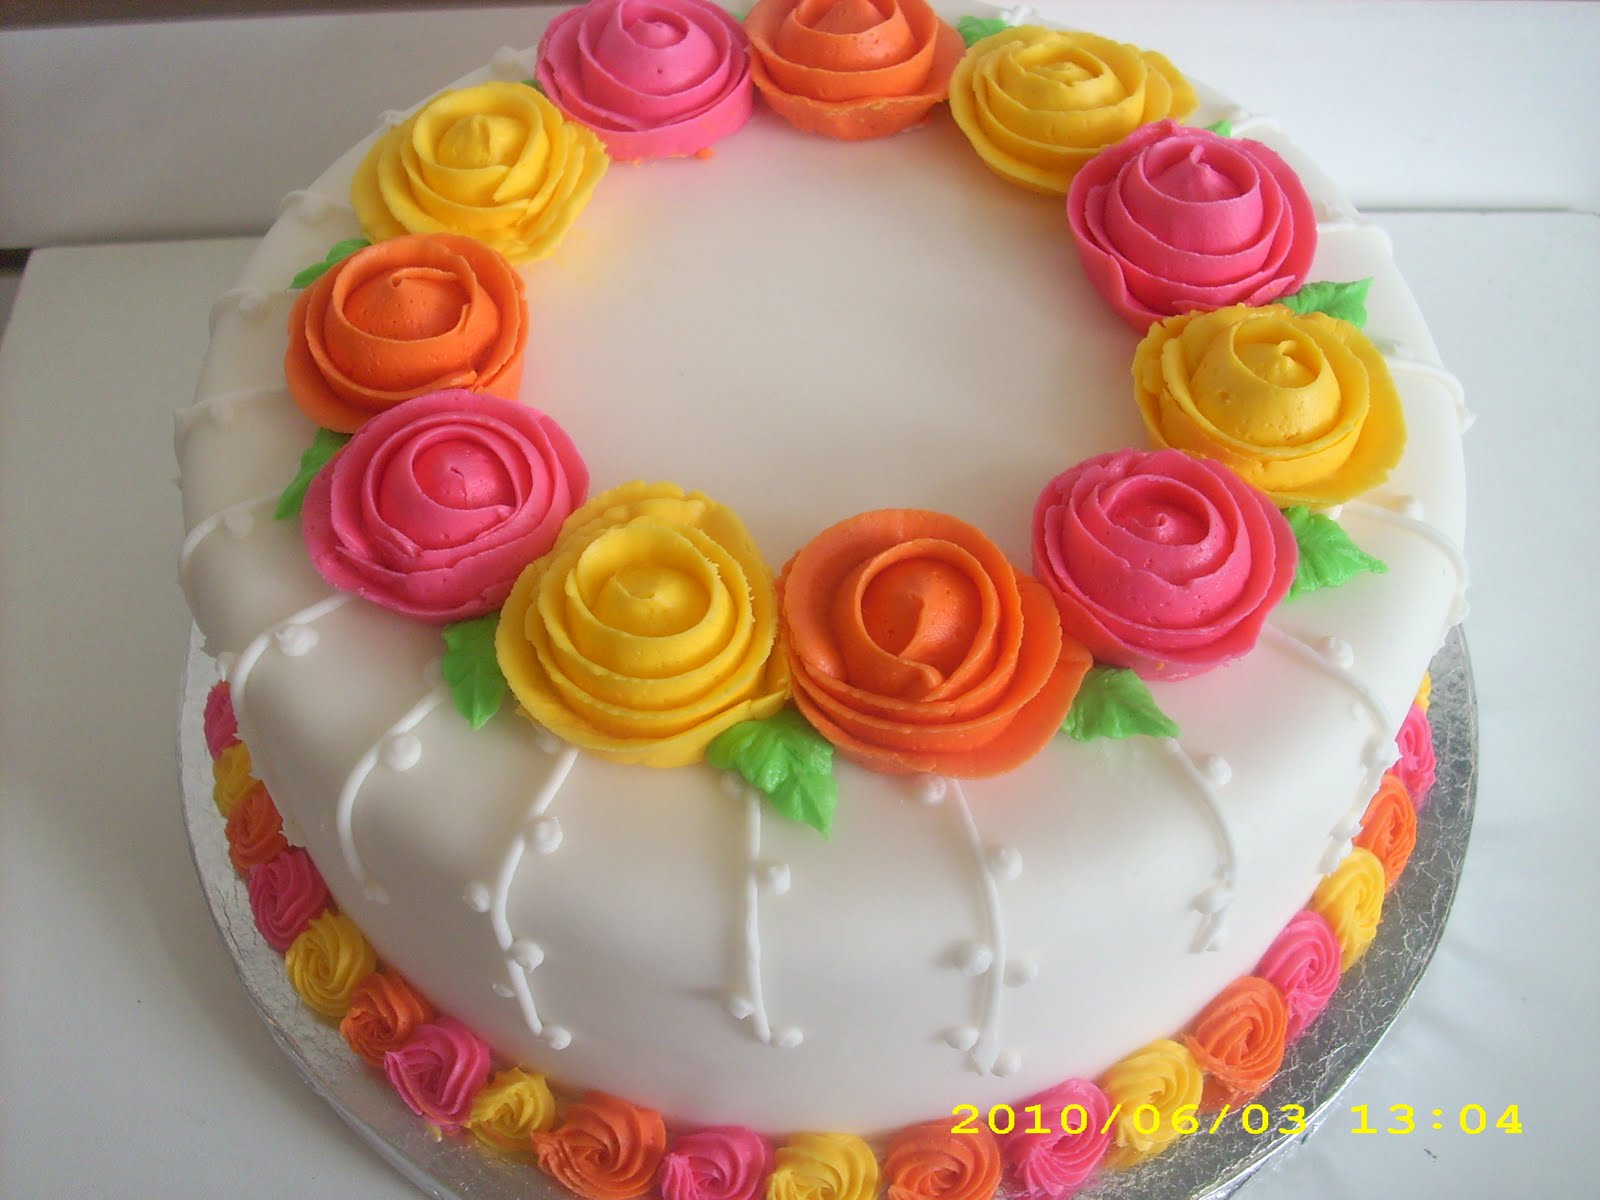 Cake A Thon Decorating Basics Wilton Method Course